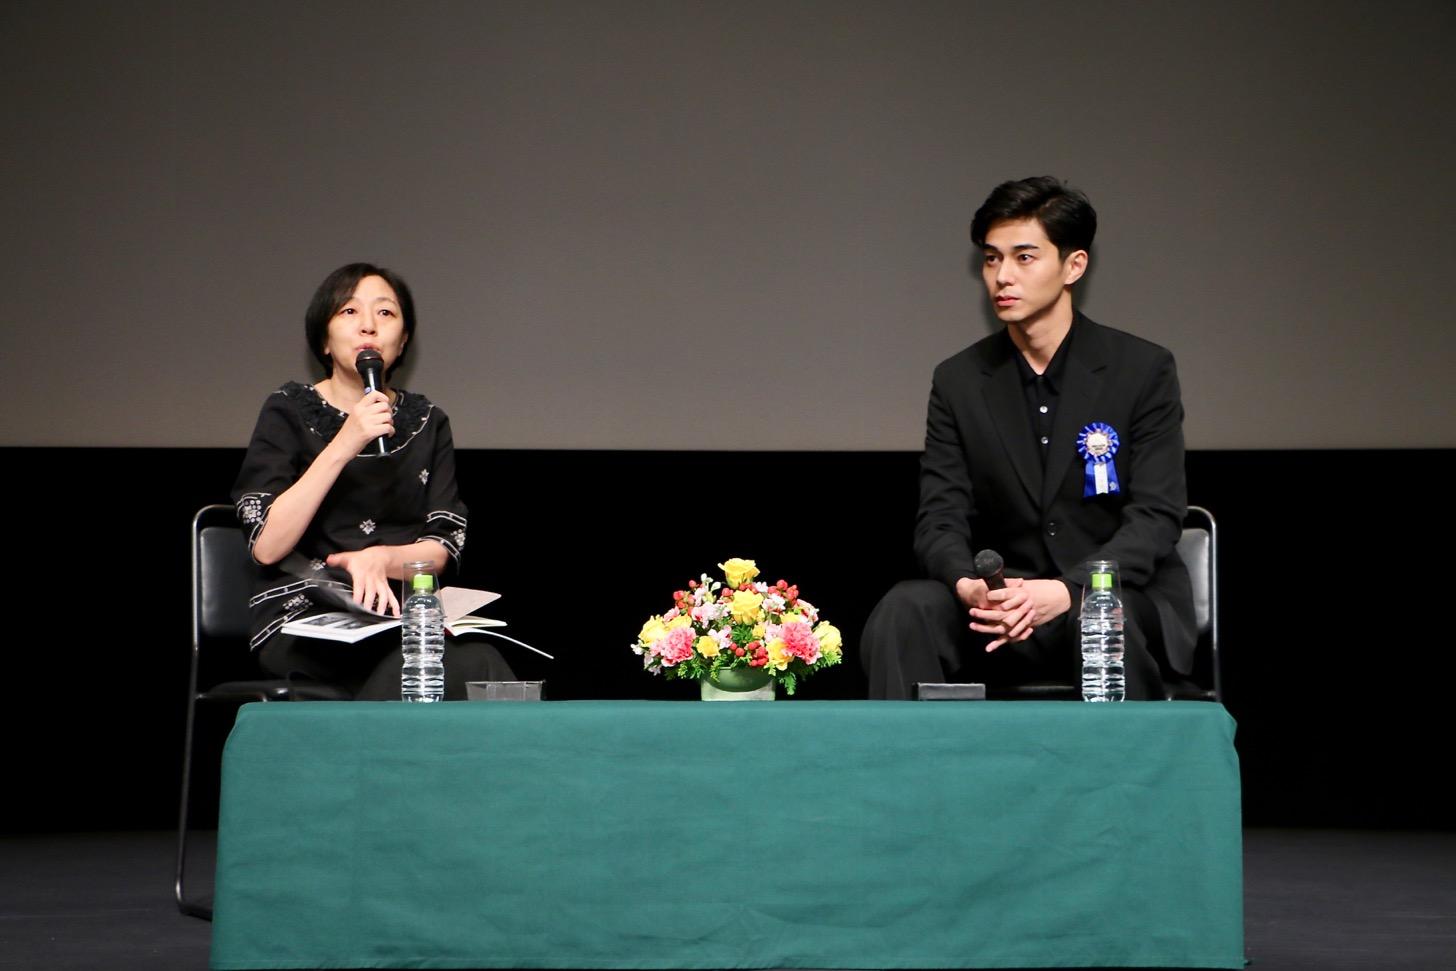 東出昌大第28回映画祭TAMA CINEMA FORUM2日目